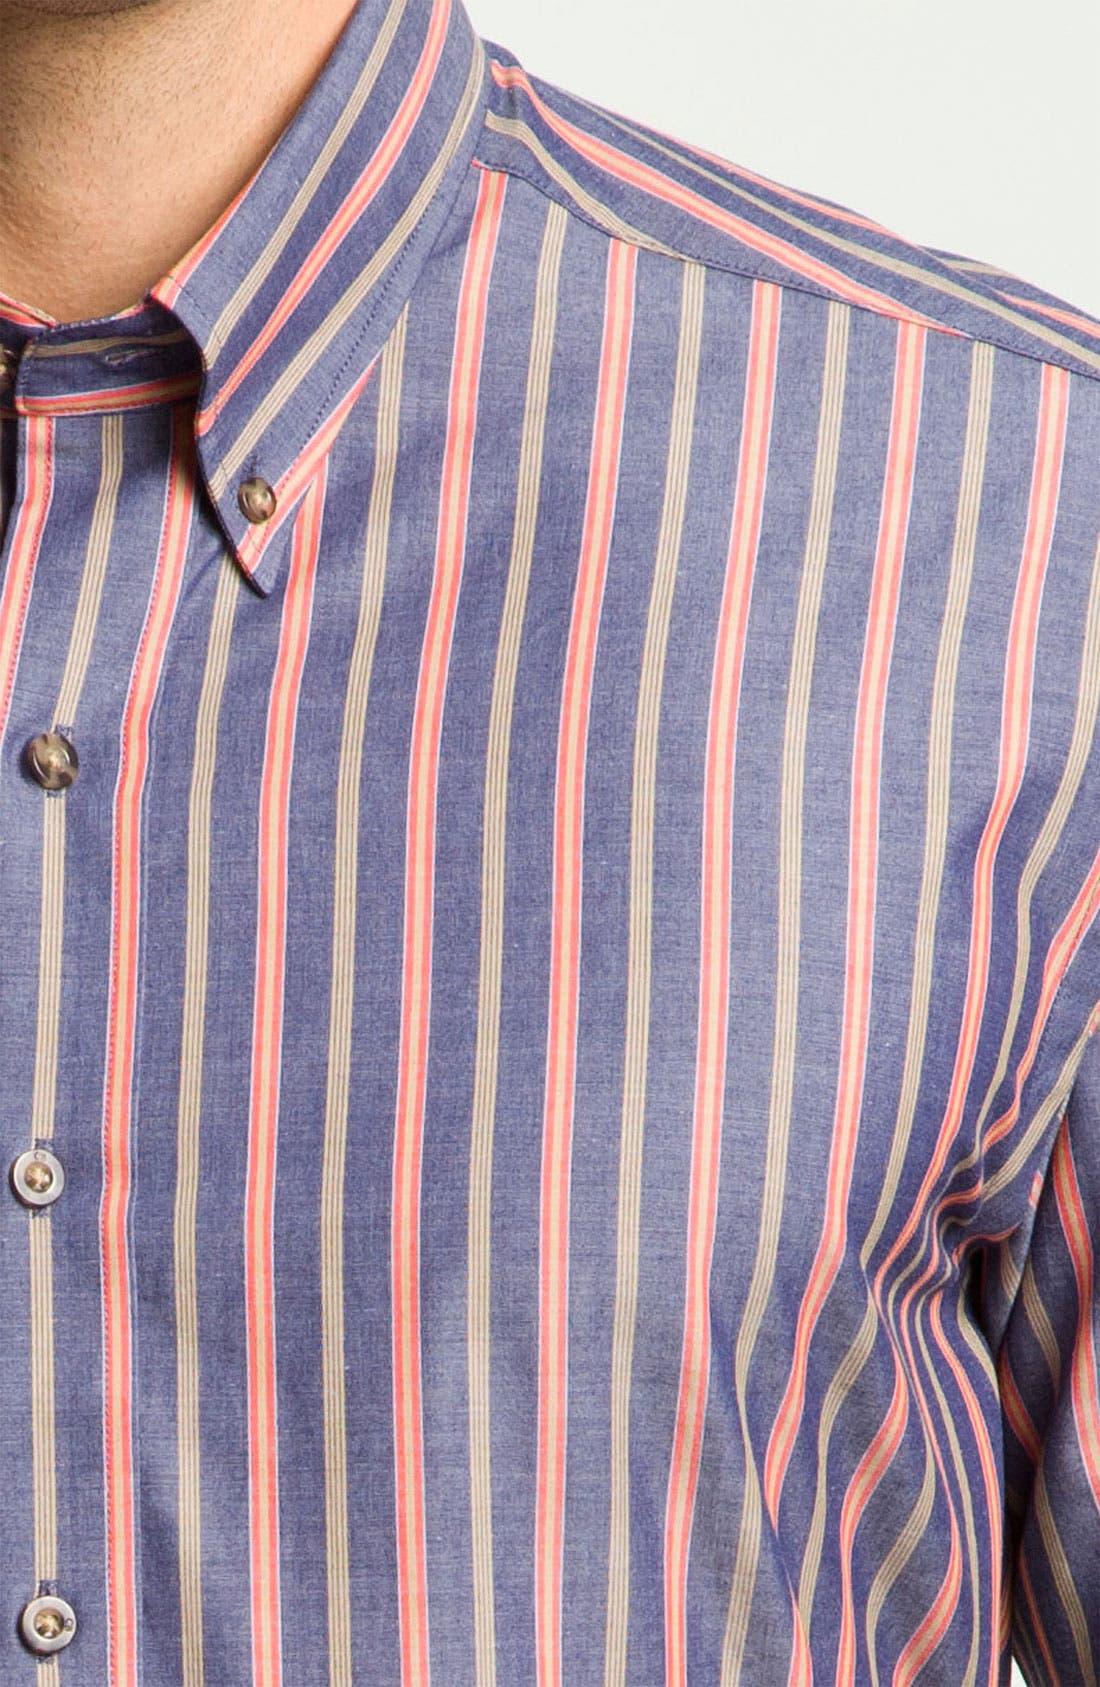 Alternate Image 3  - Cutter & Buck 'Harvest' Stripe Sport Shirt (Big & Tall) (Online Only)